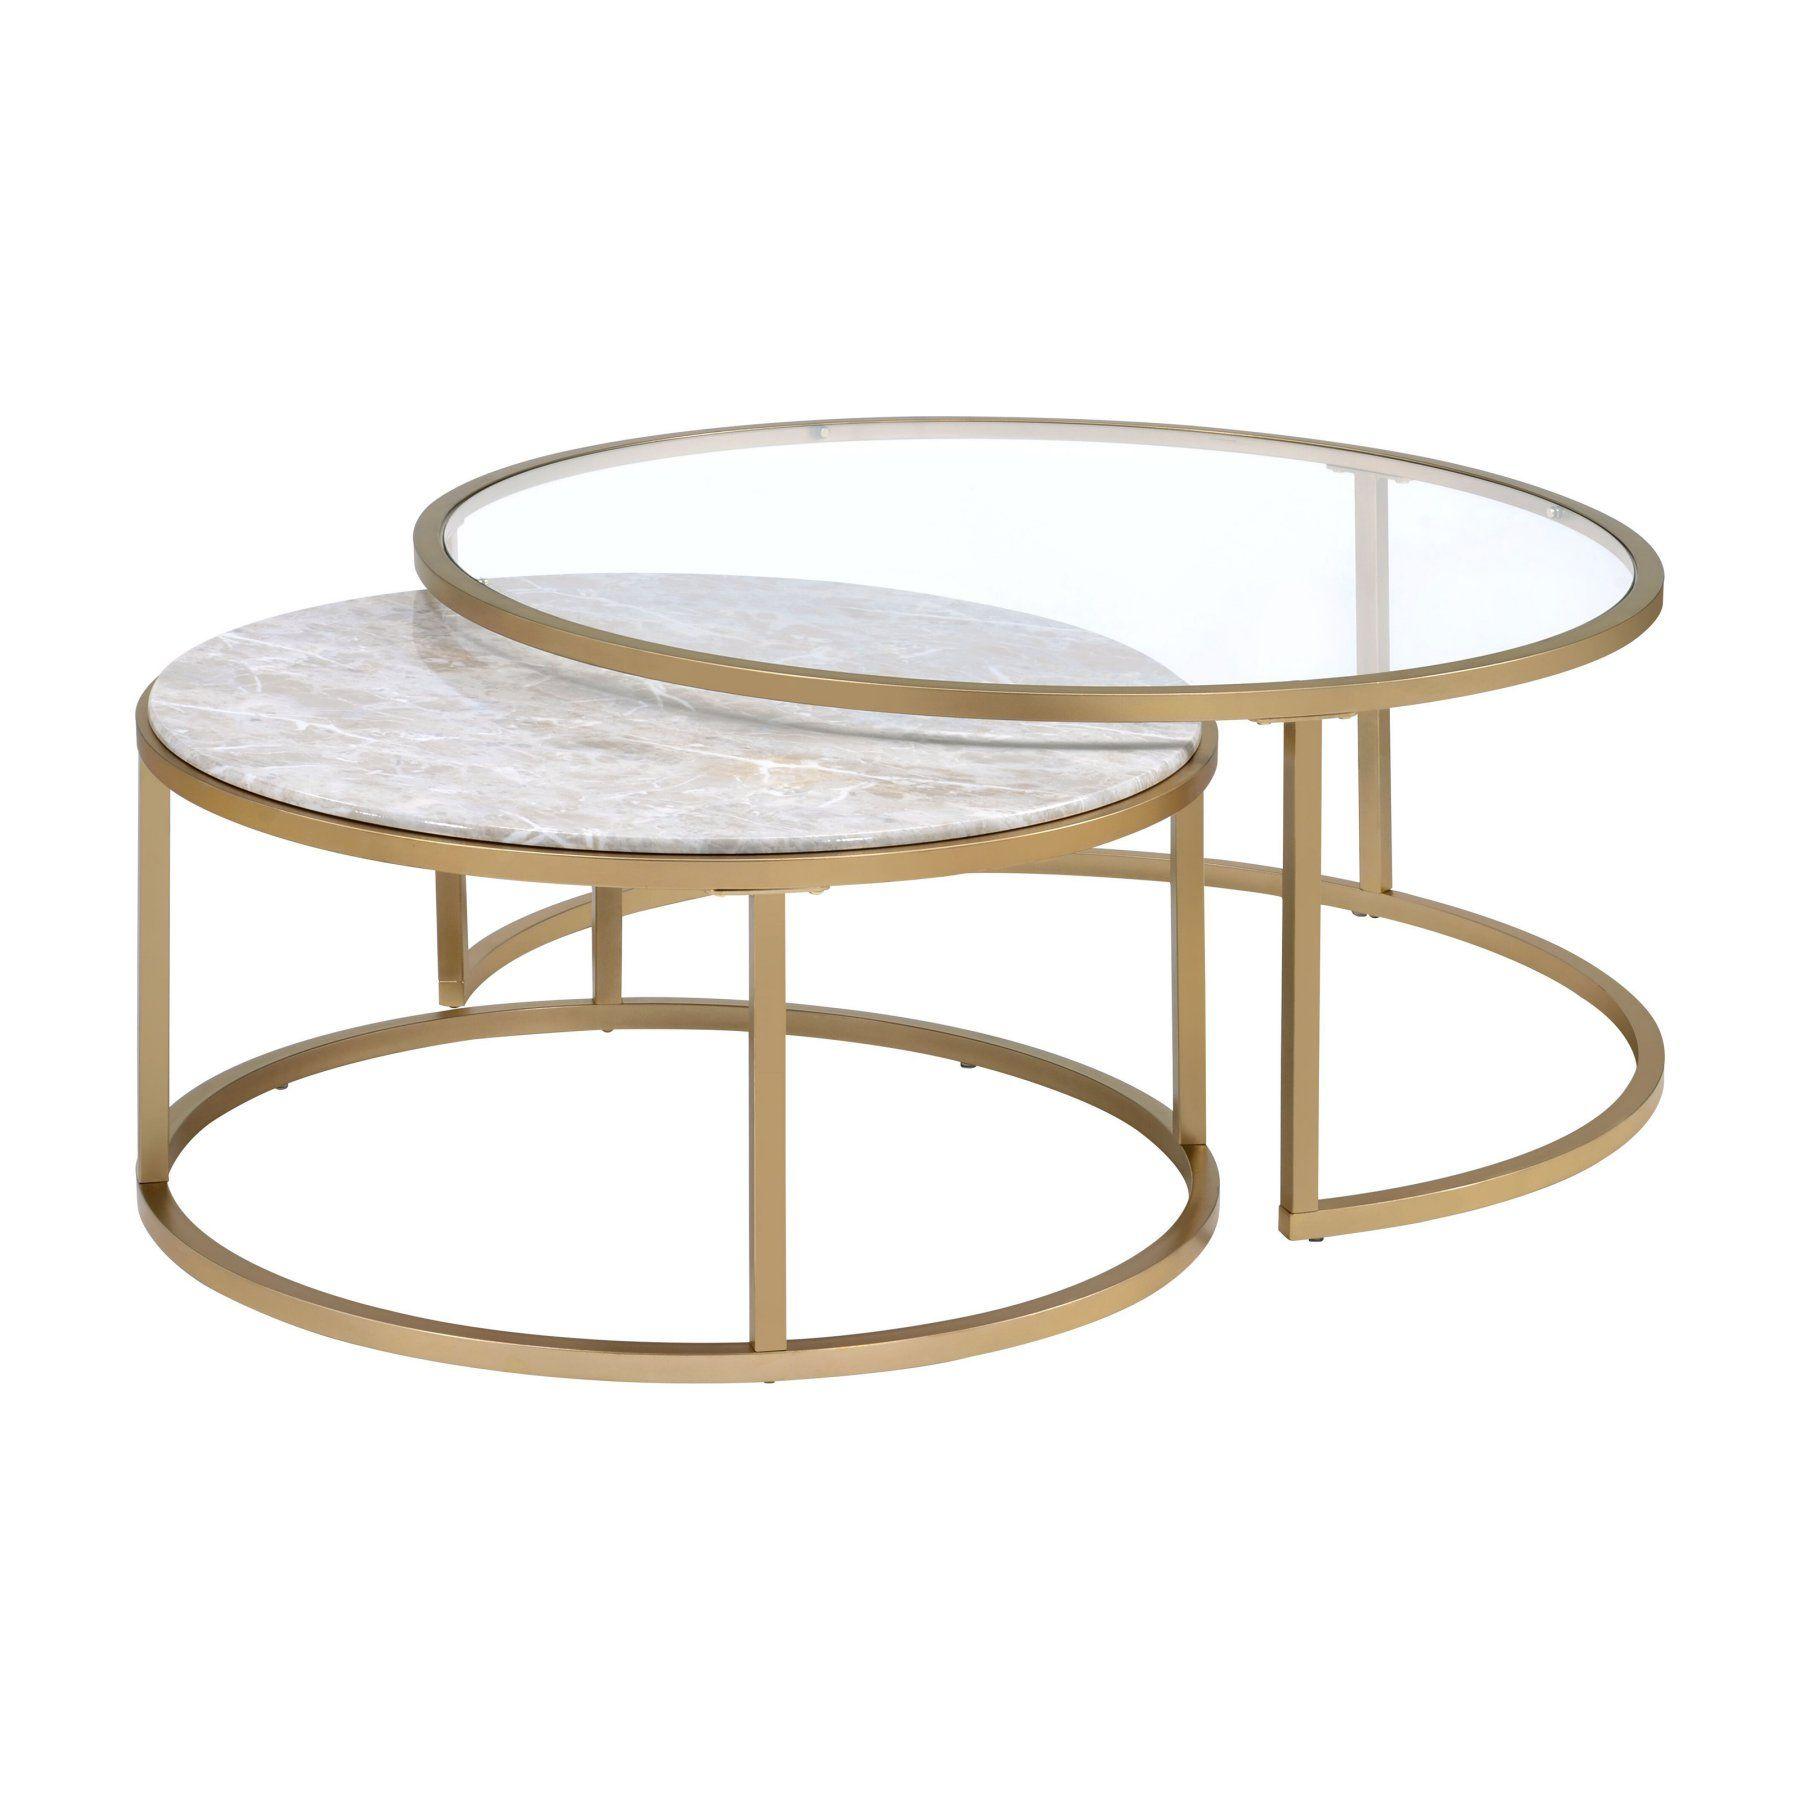 Acme Furniture Shanish 2 Piece Nesting Coffee Table Set Nesting Coffee Tables Coffee Table Gold Nesting Coffee Table [ 1800 x 1800 Pixel ]